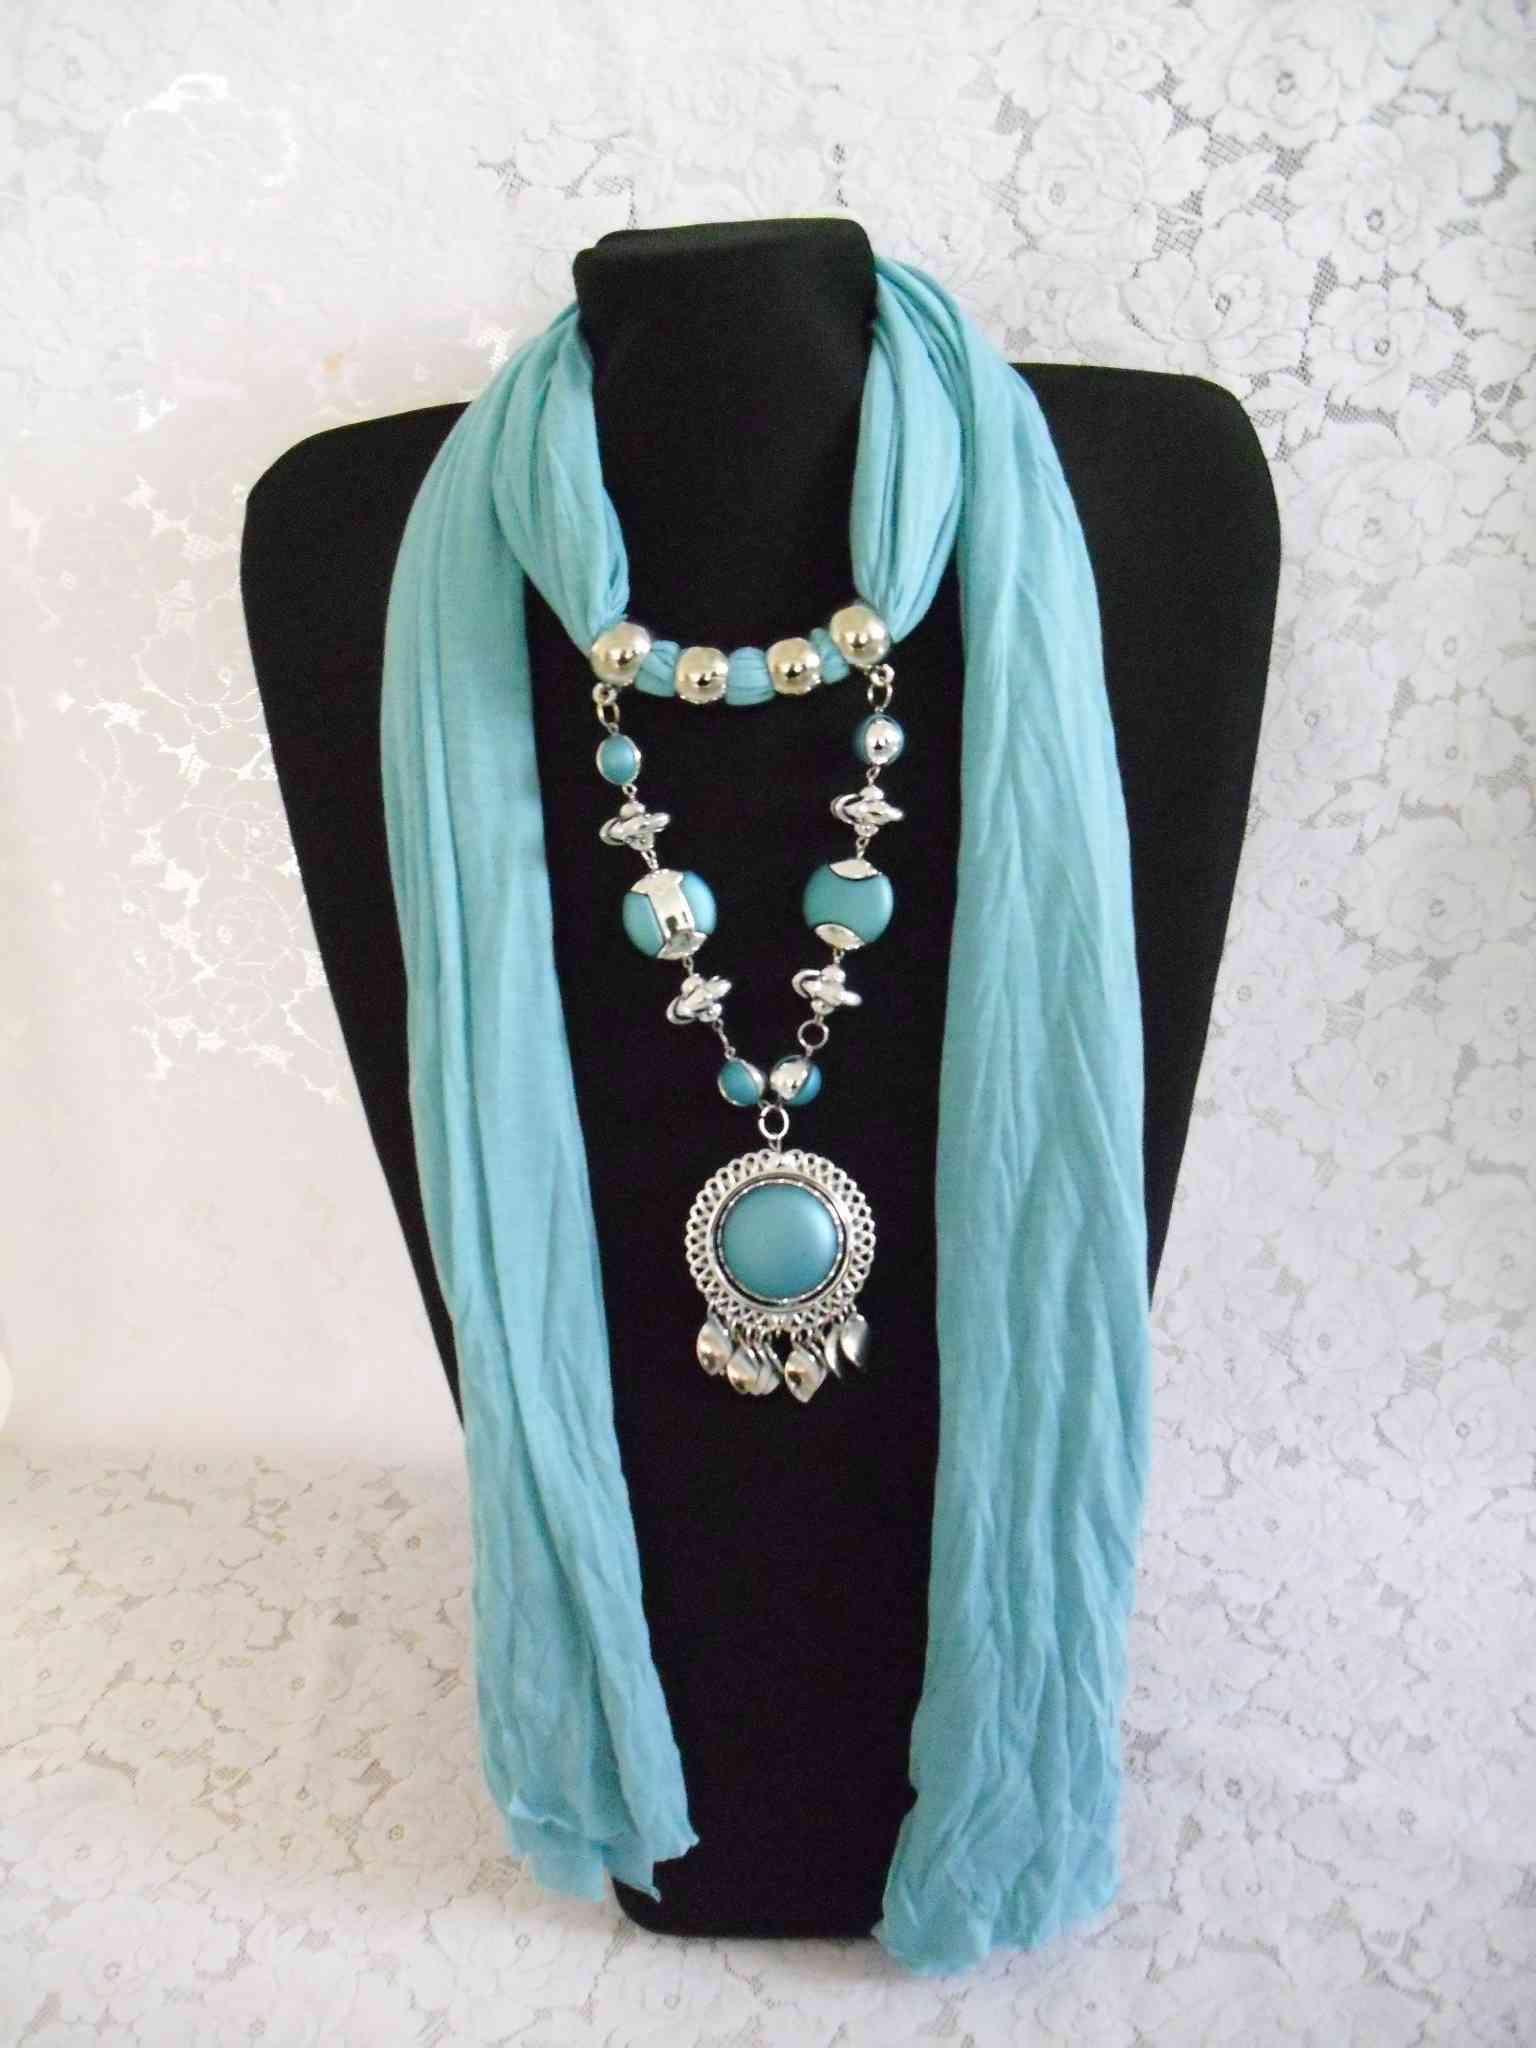 dhl free 2012 amazing scarf jewelry pendant scarves